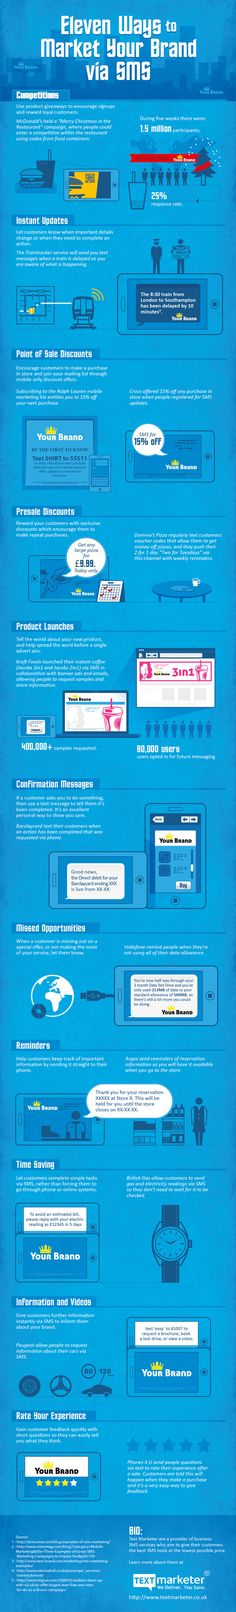 11 Ways to Market Your Brand via SMS